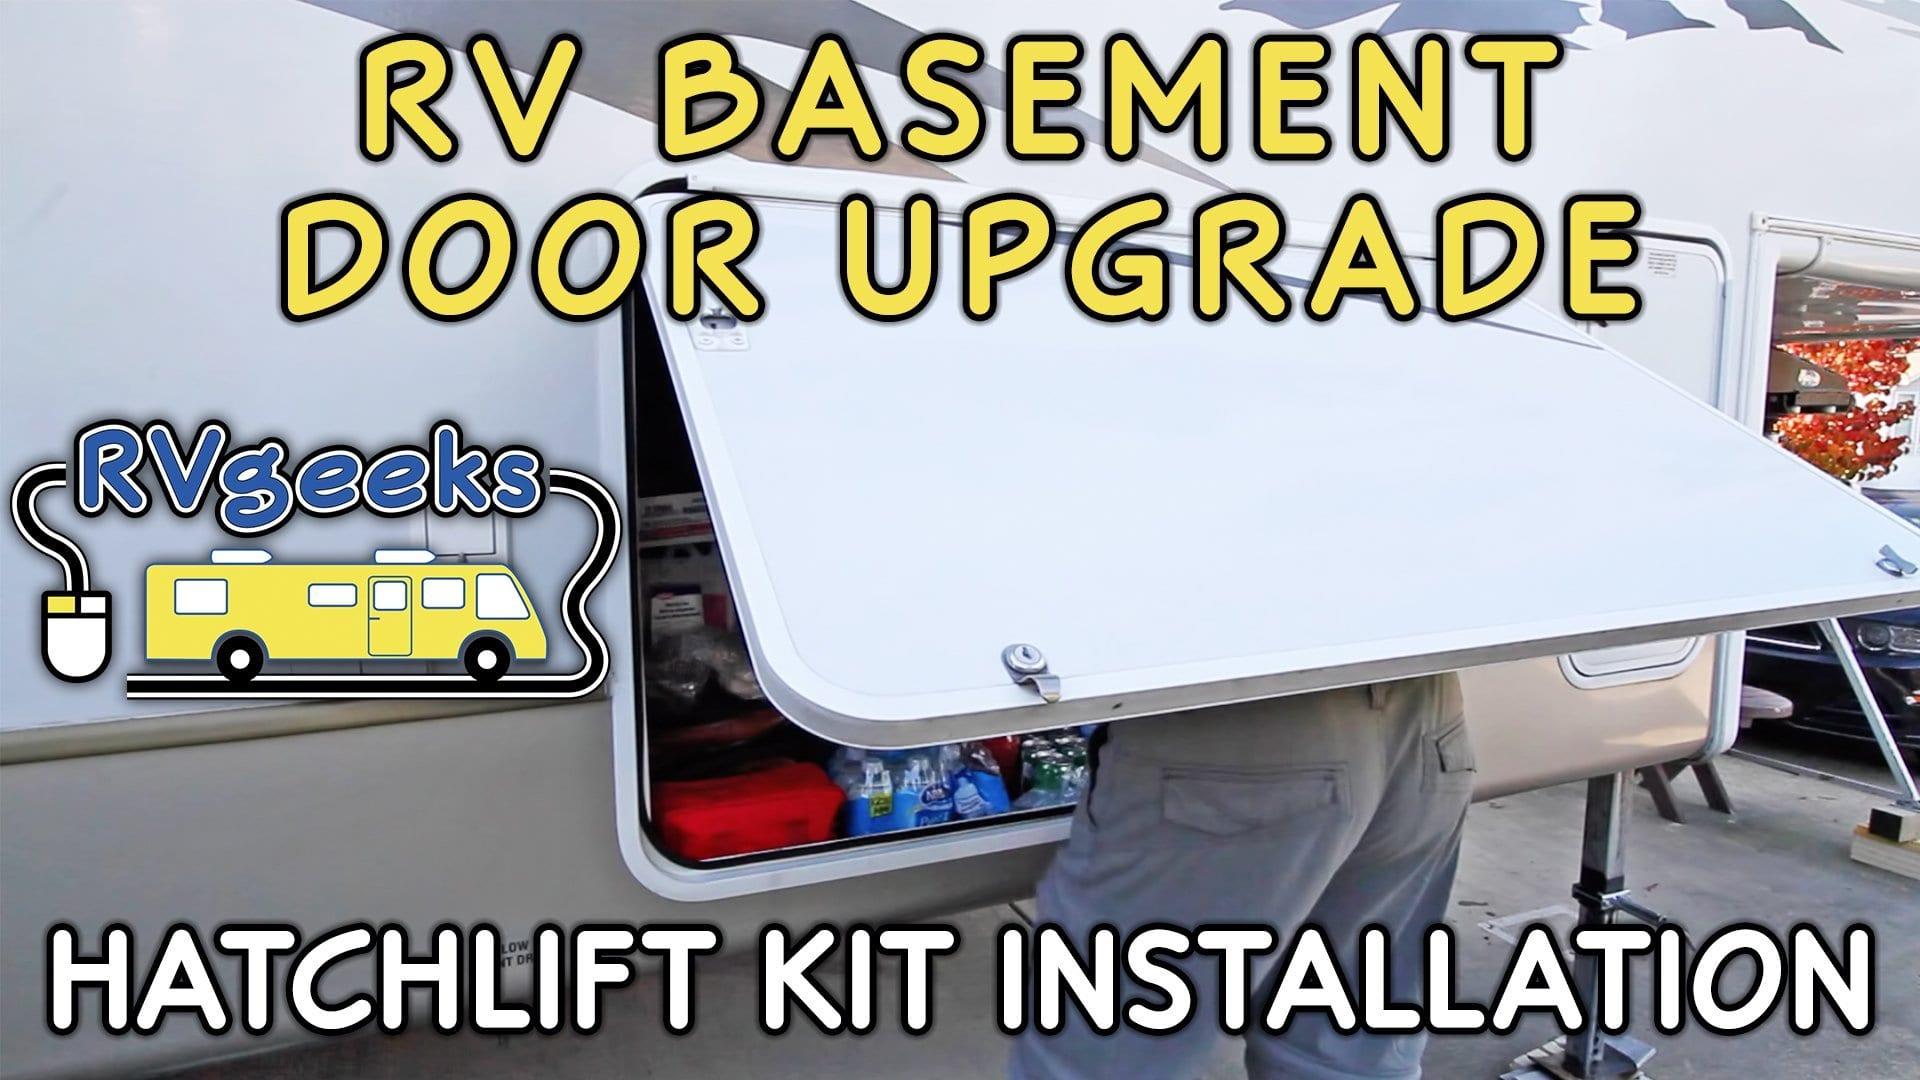 Mobile Home Thermostat Wiring Diagram Hatchlift Rv Basement Door Lift Kit Installation